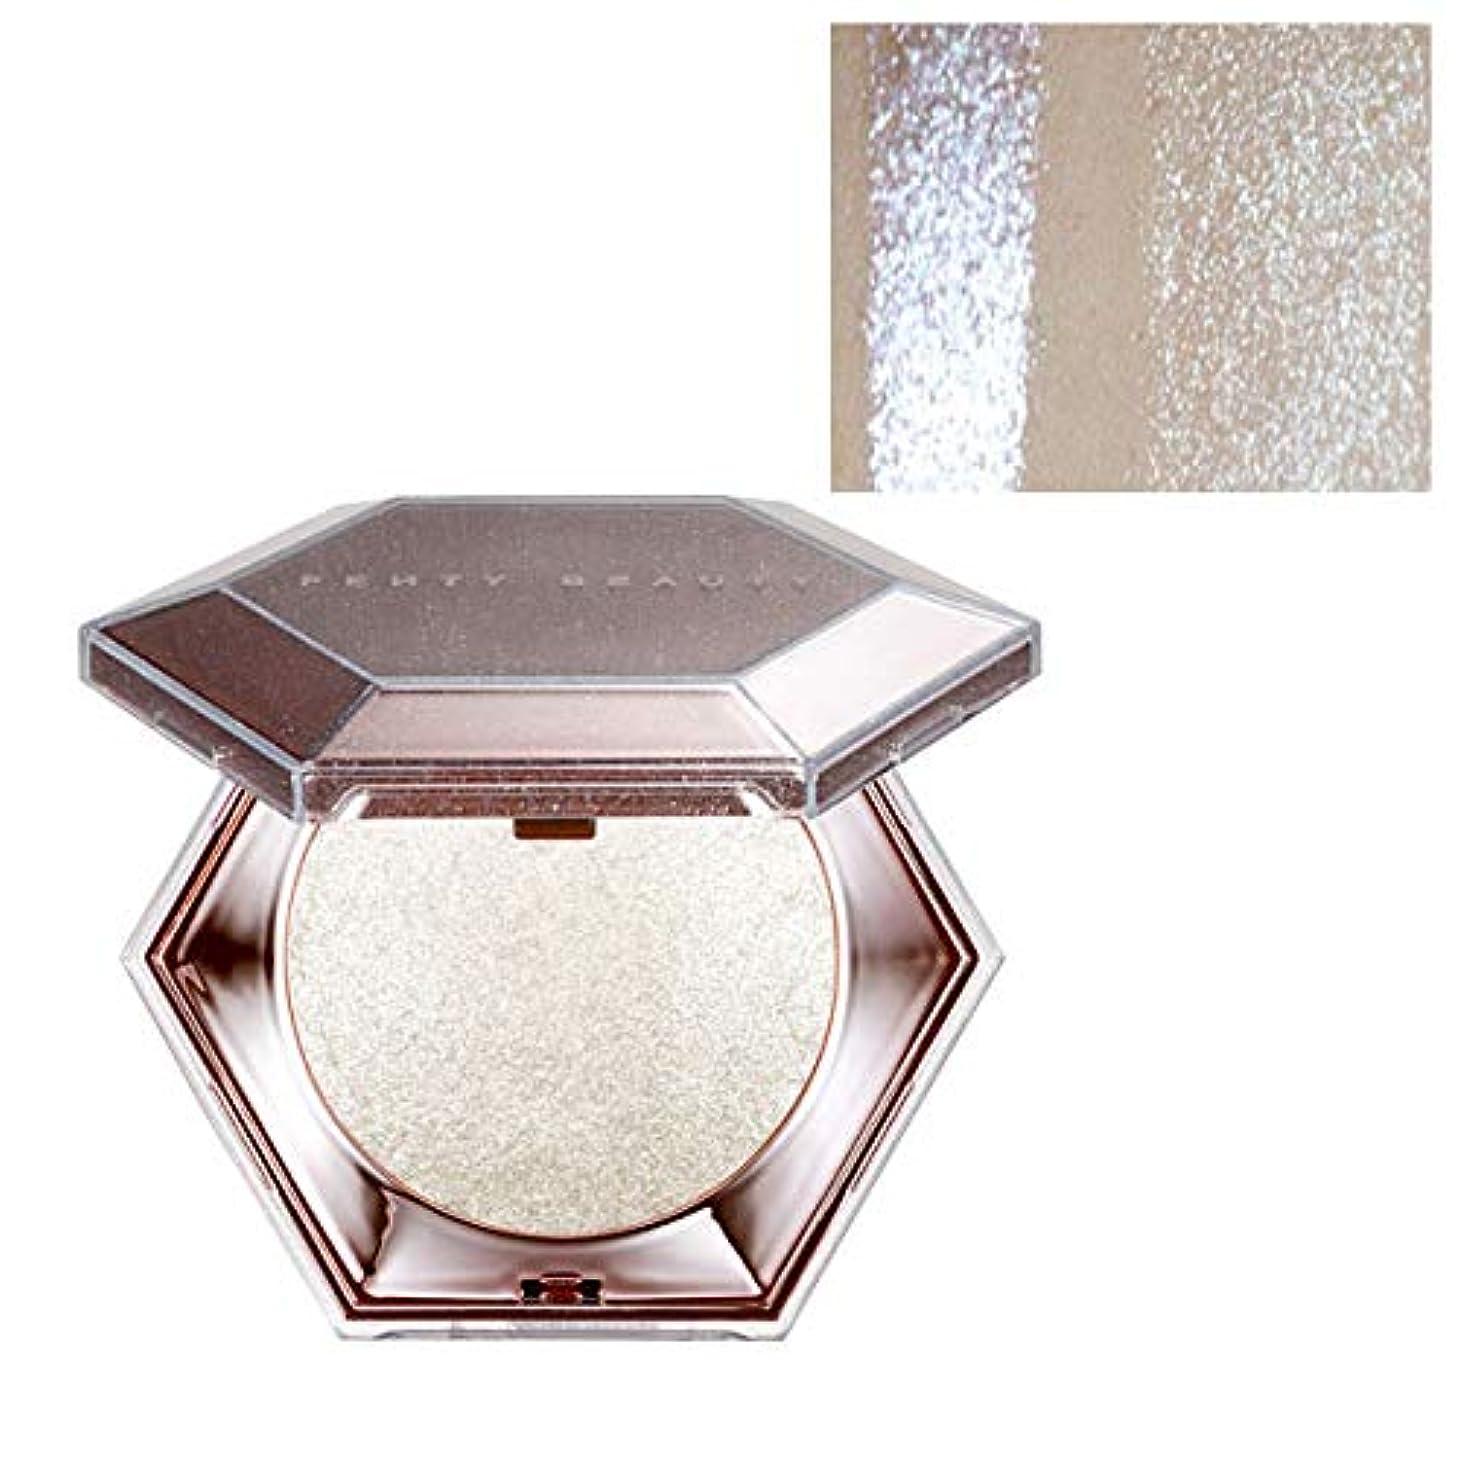 賞開拓者テニスFENTY BEAUTY BY RIHANNA Diamond Bomb All-Over Diamond Veil [海外直送品] [並行輸入品]